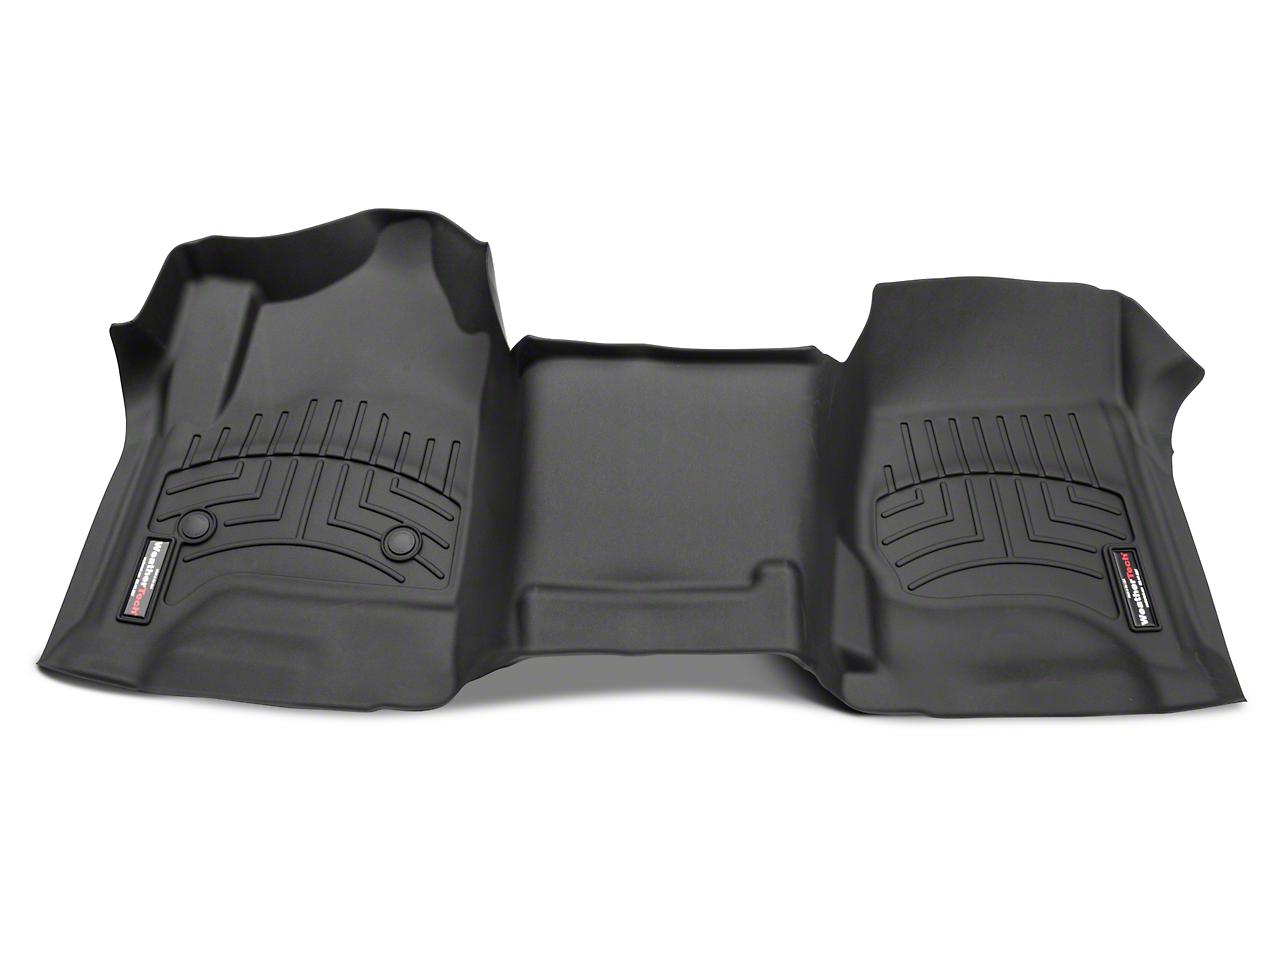 Weathertech DigitalFit Front Floor Liner - Over The Hump - Cocoa (14-18 Silverado 1500 w/o Floor Shifter)